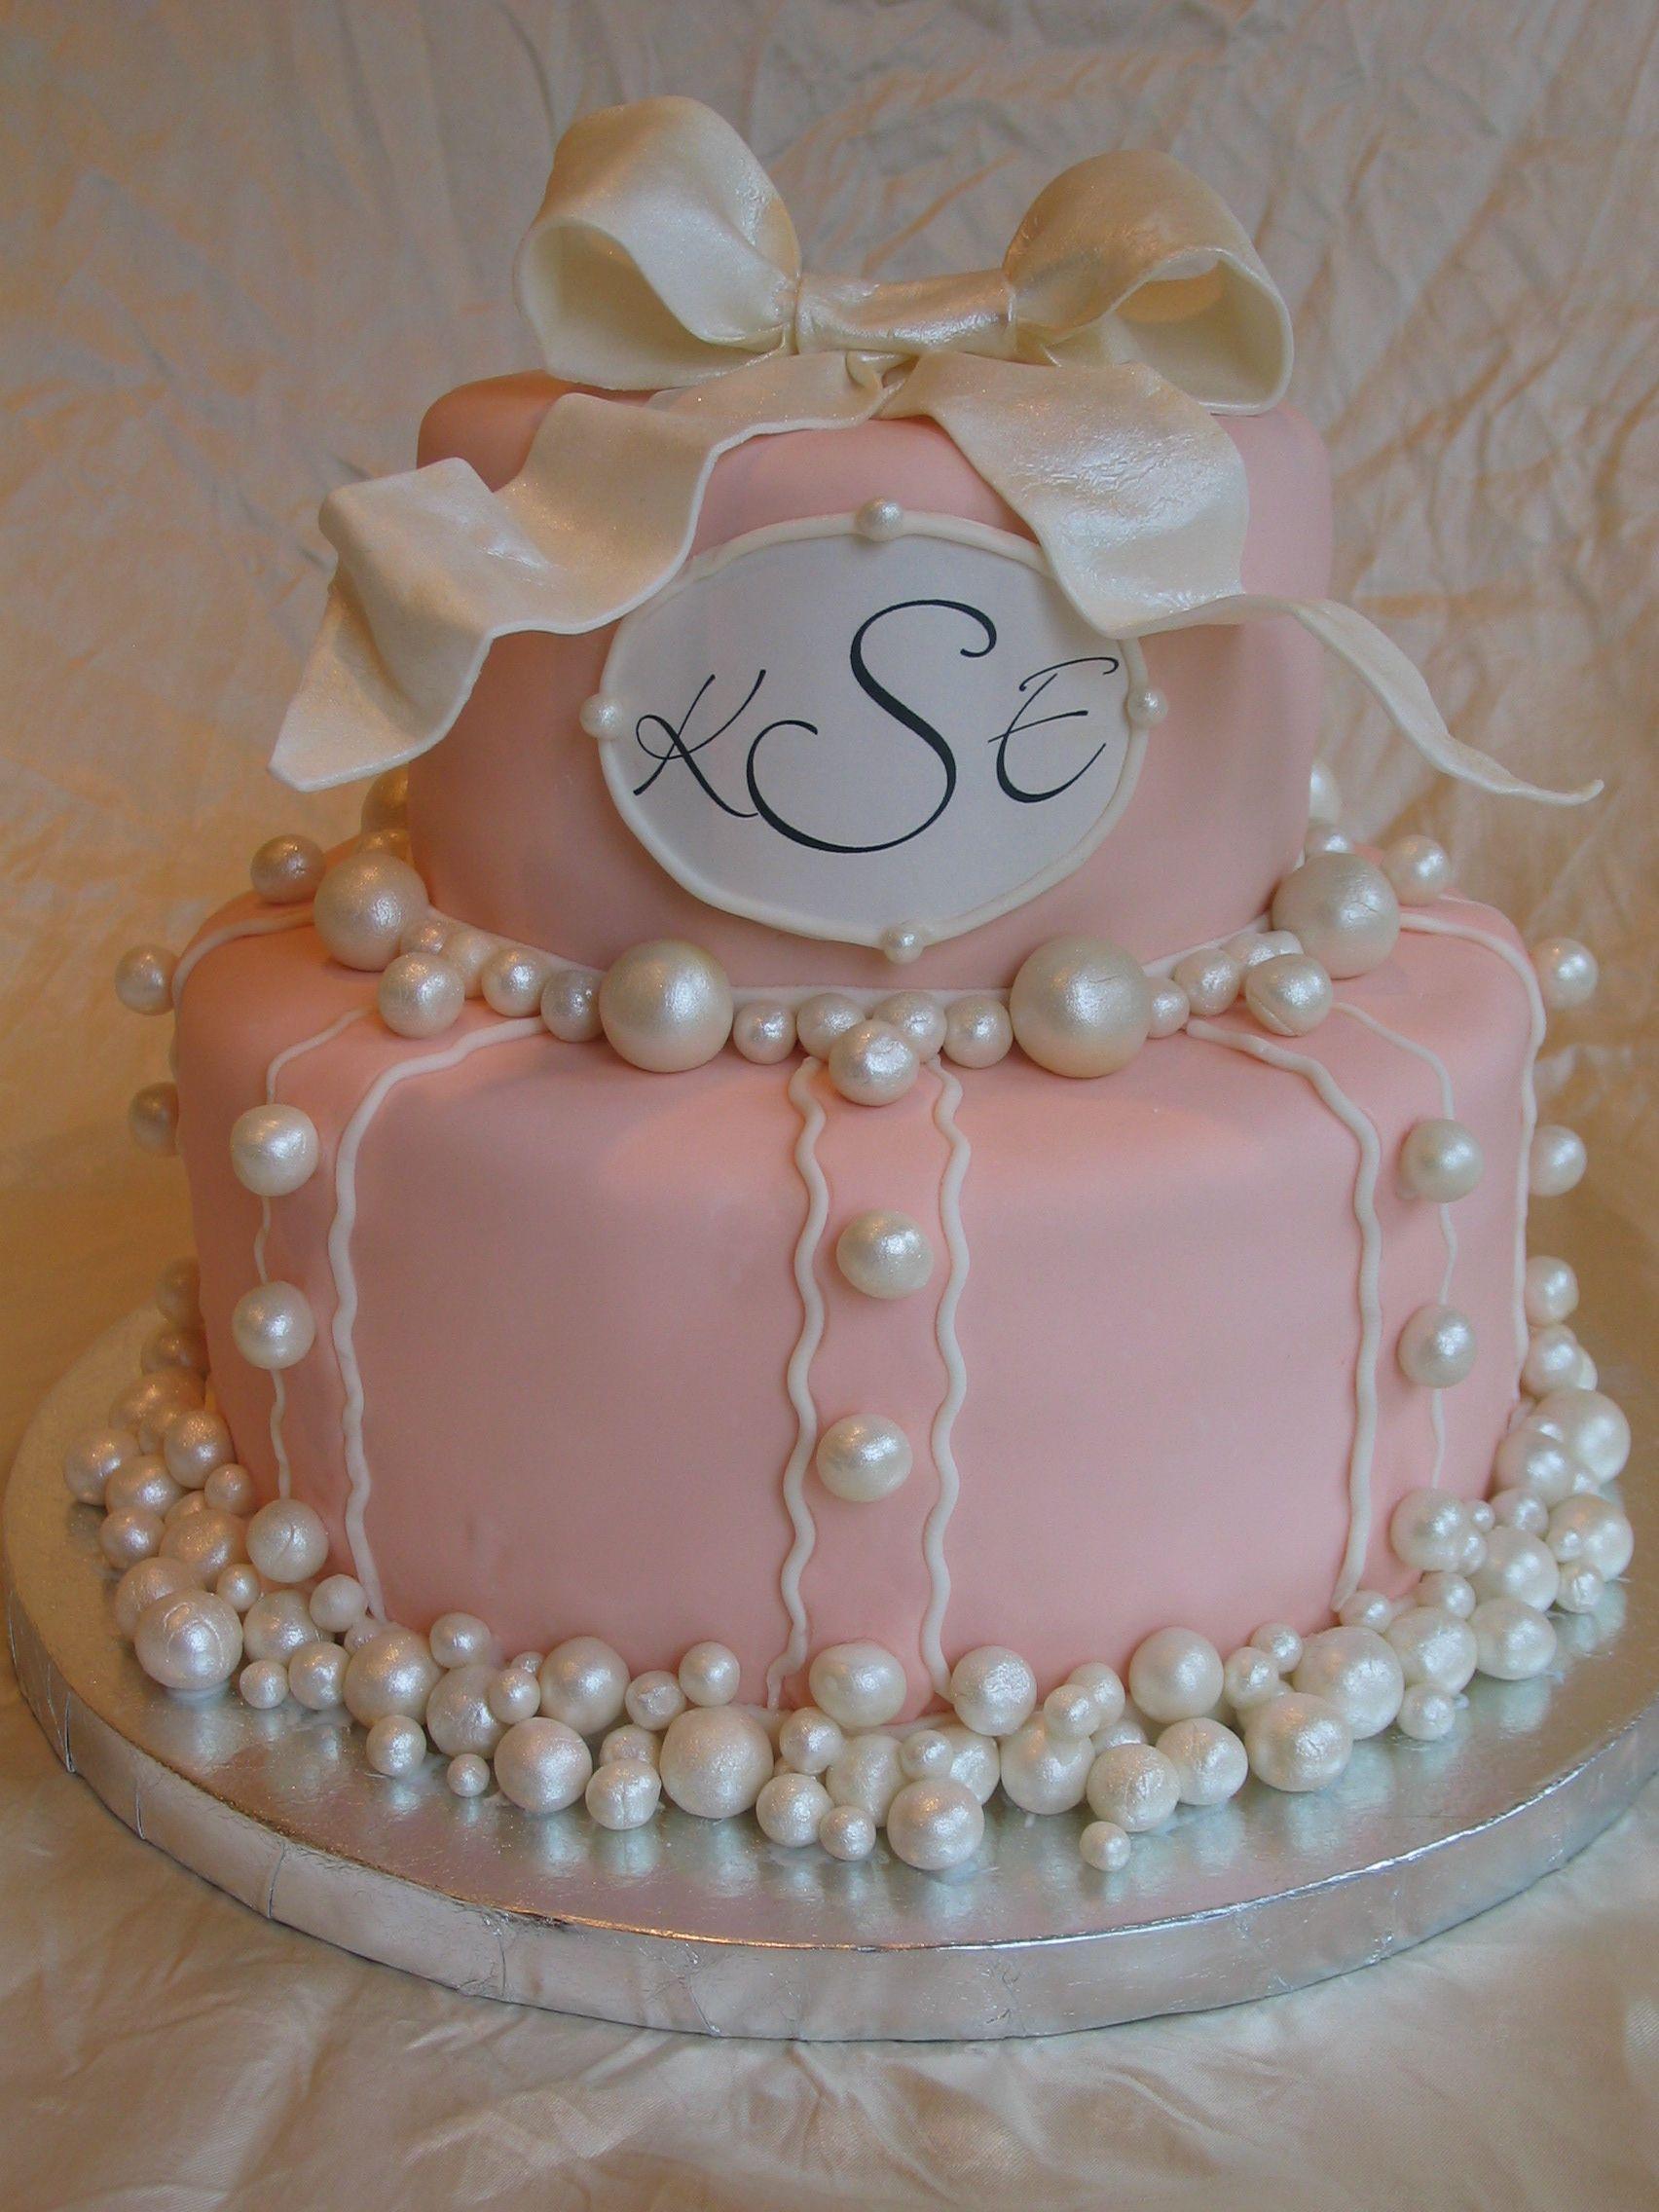 Marvelous Bridal Shower Pearl Cake June Birthstone Charlottesville Va Birthday Cards Printable Trancafe Filternl